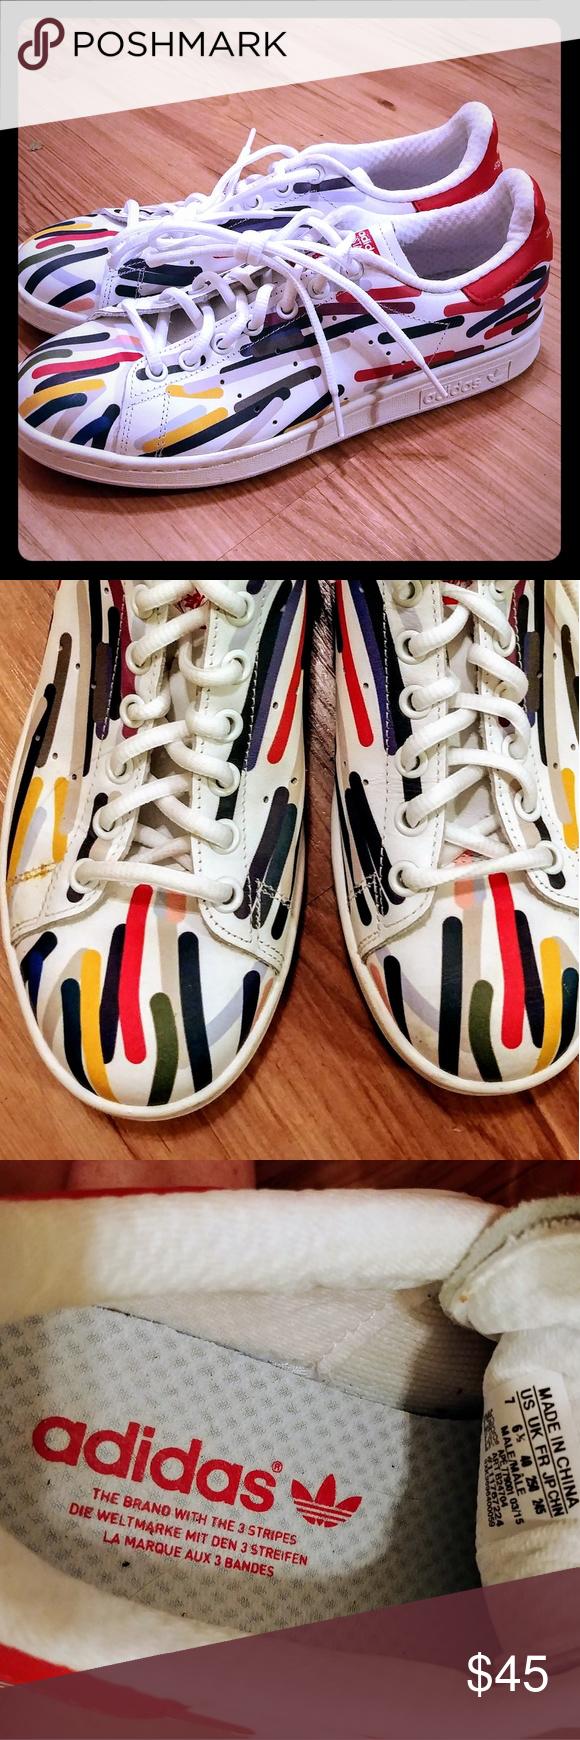 nuove adidas stan smith è dipinto strisce m7 w9 pinterest vernice